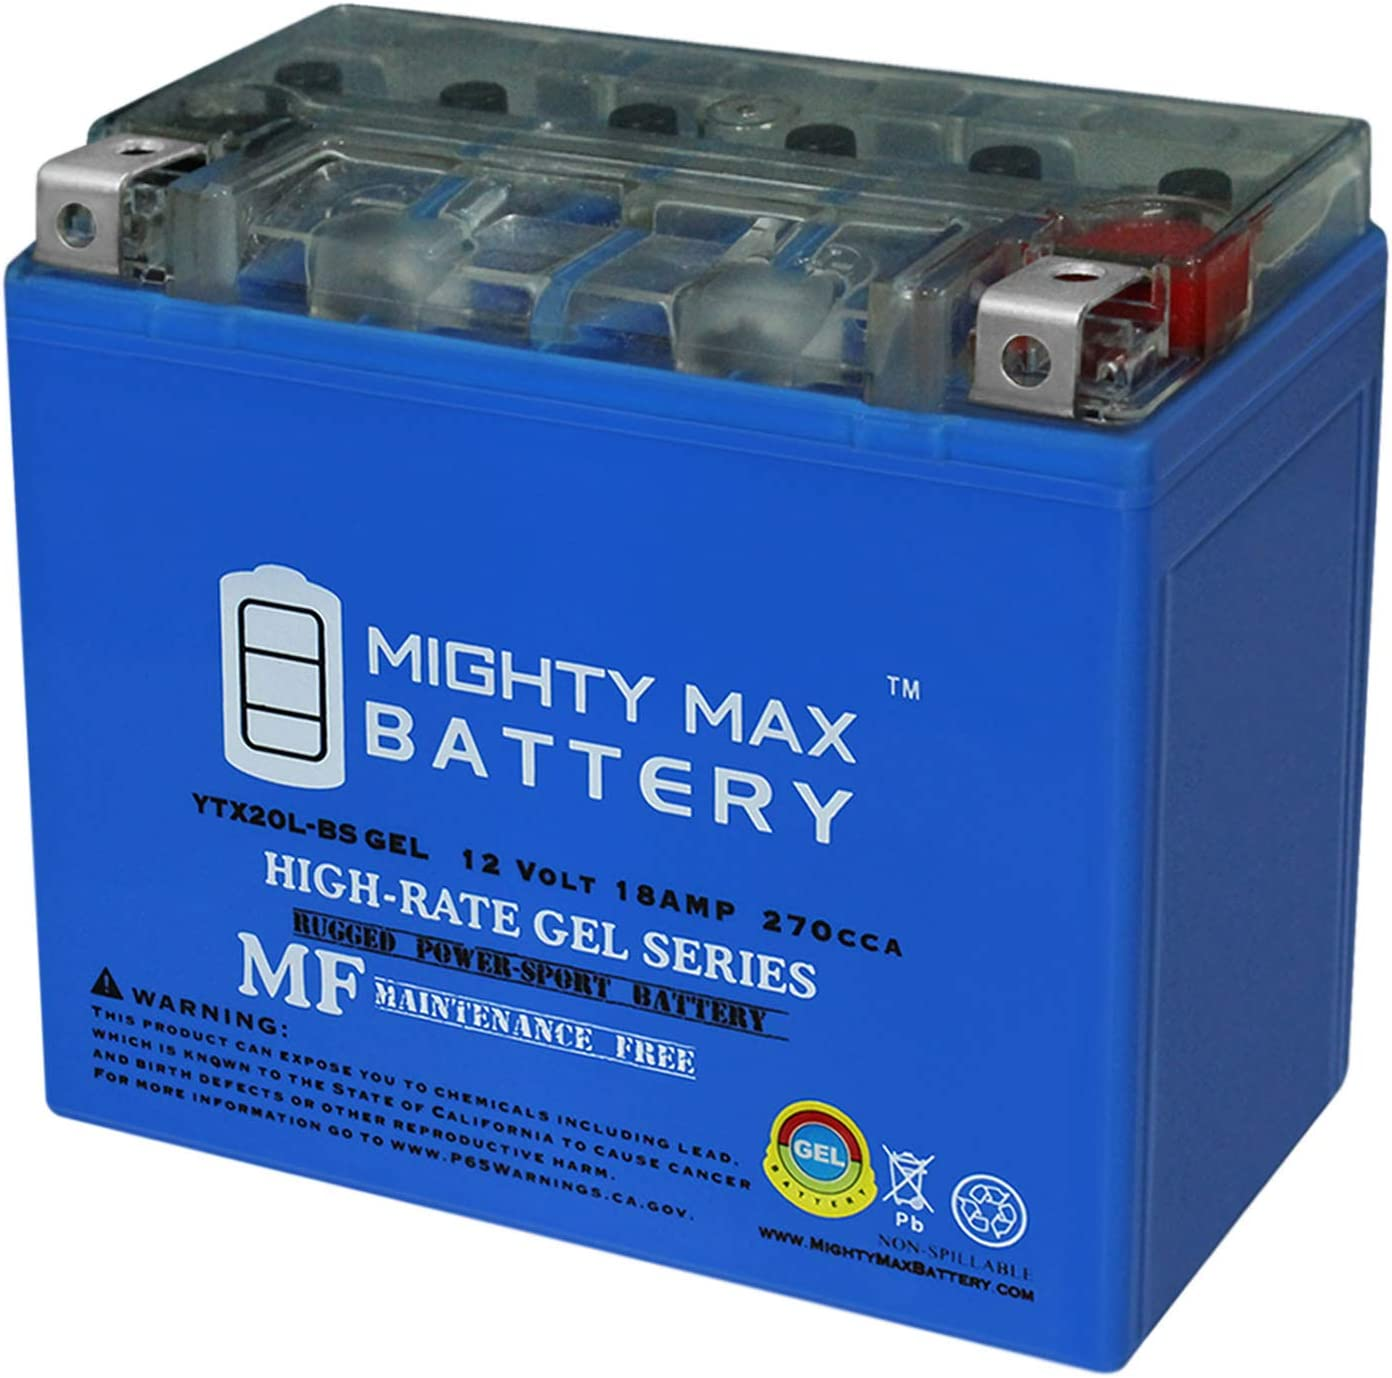 Commander 1000CC UTV Replacement Battery Can-Am BRP 2011-2018